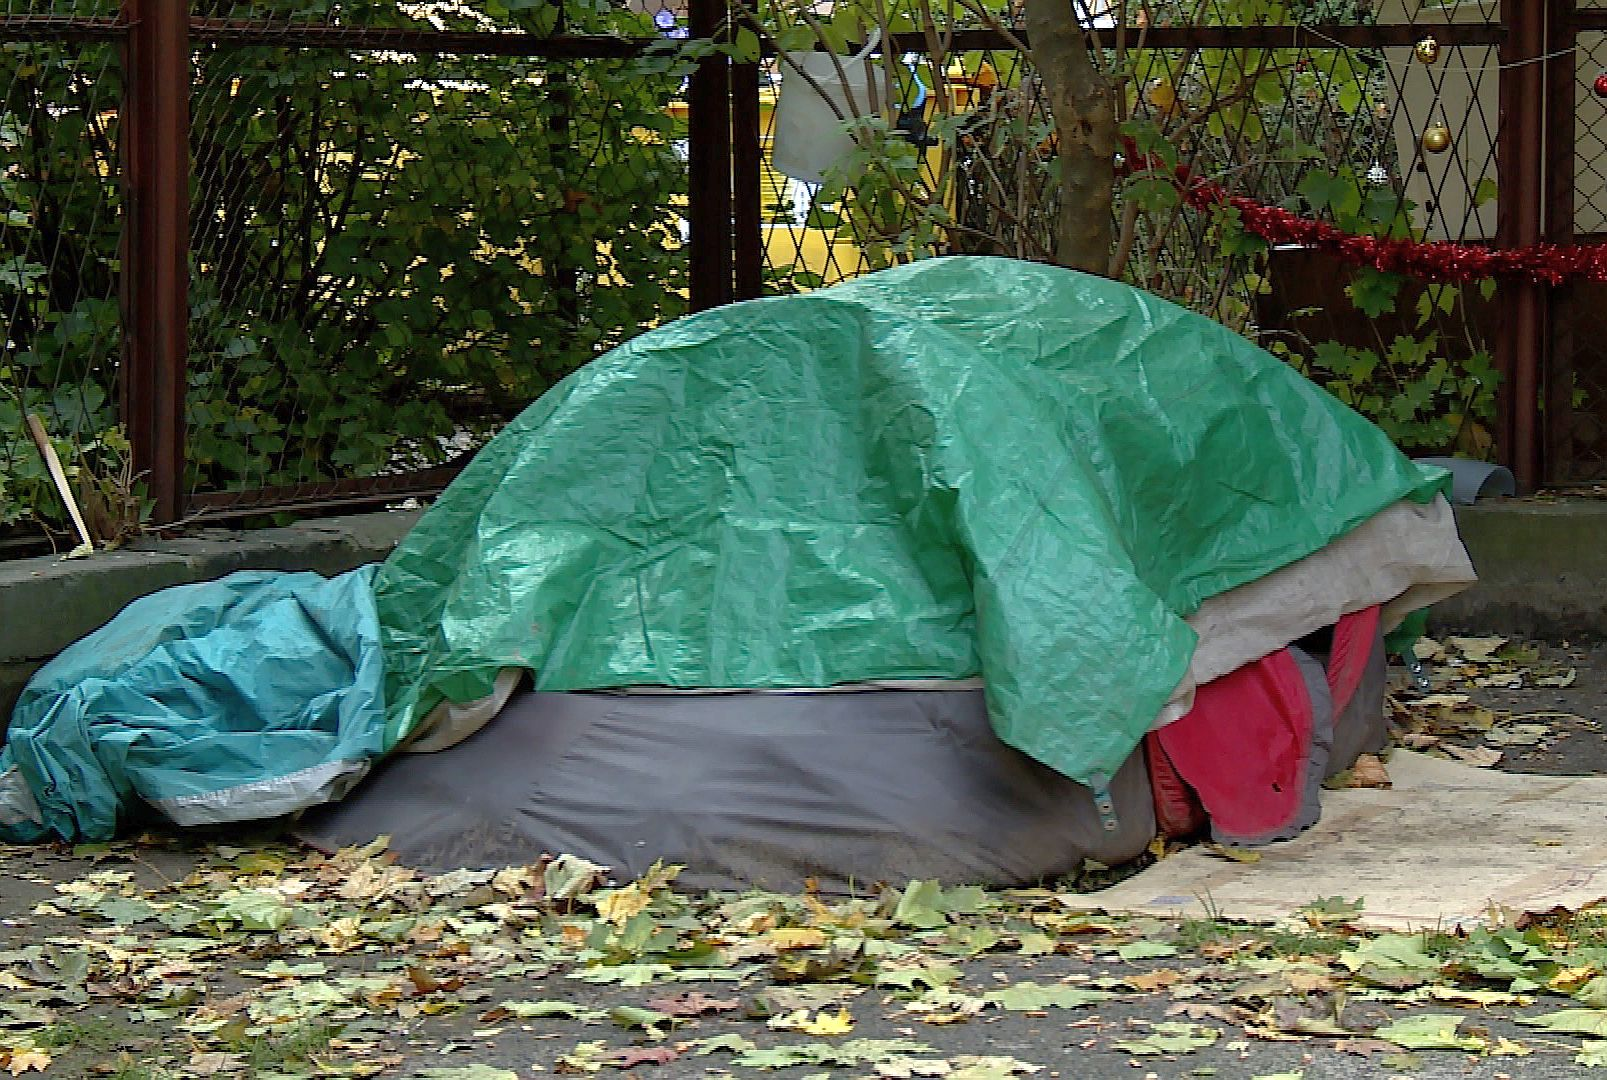 Namiot bezdomnego stoi w centrum miasta (WIDEO)